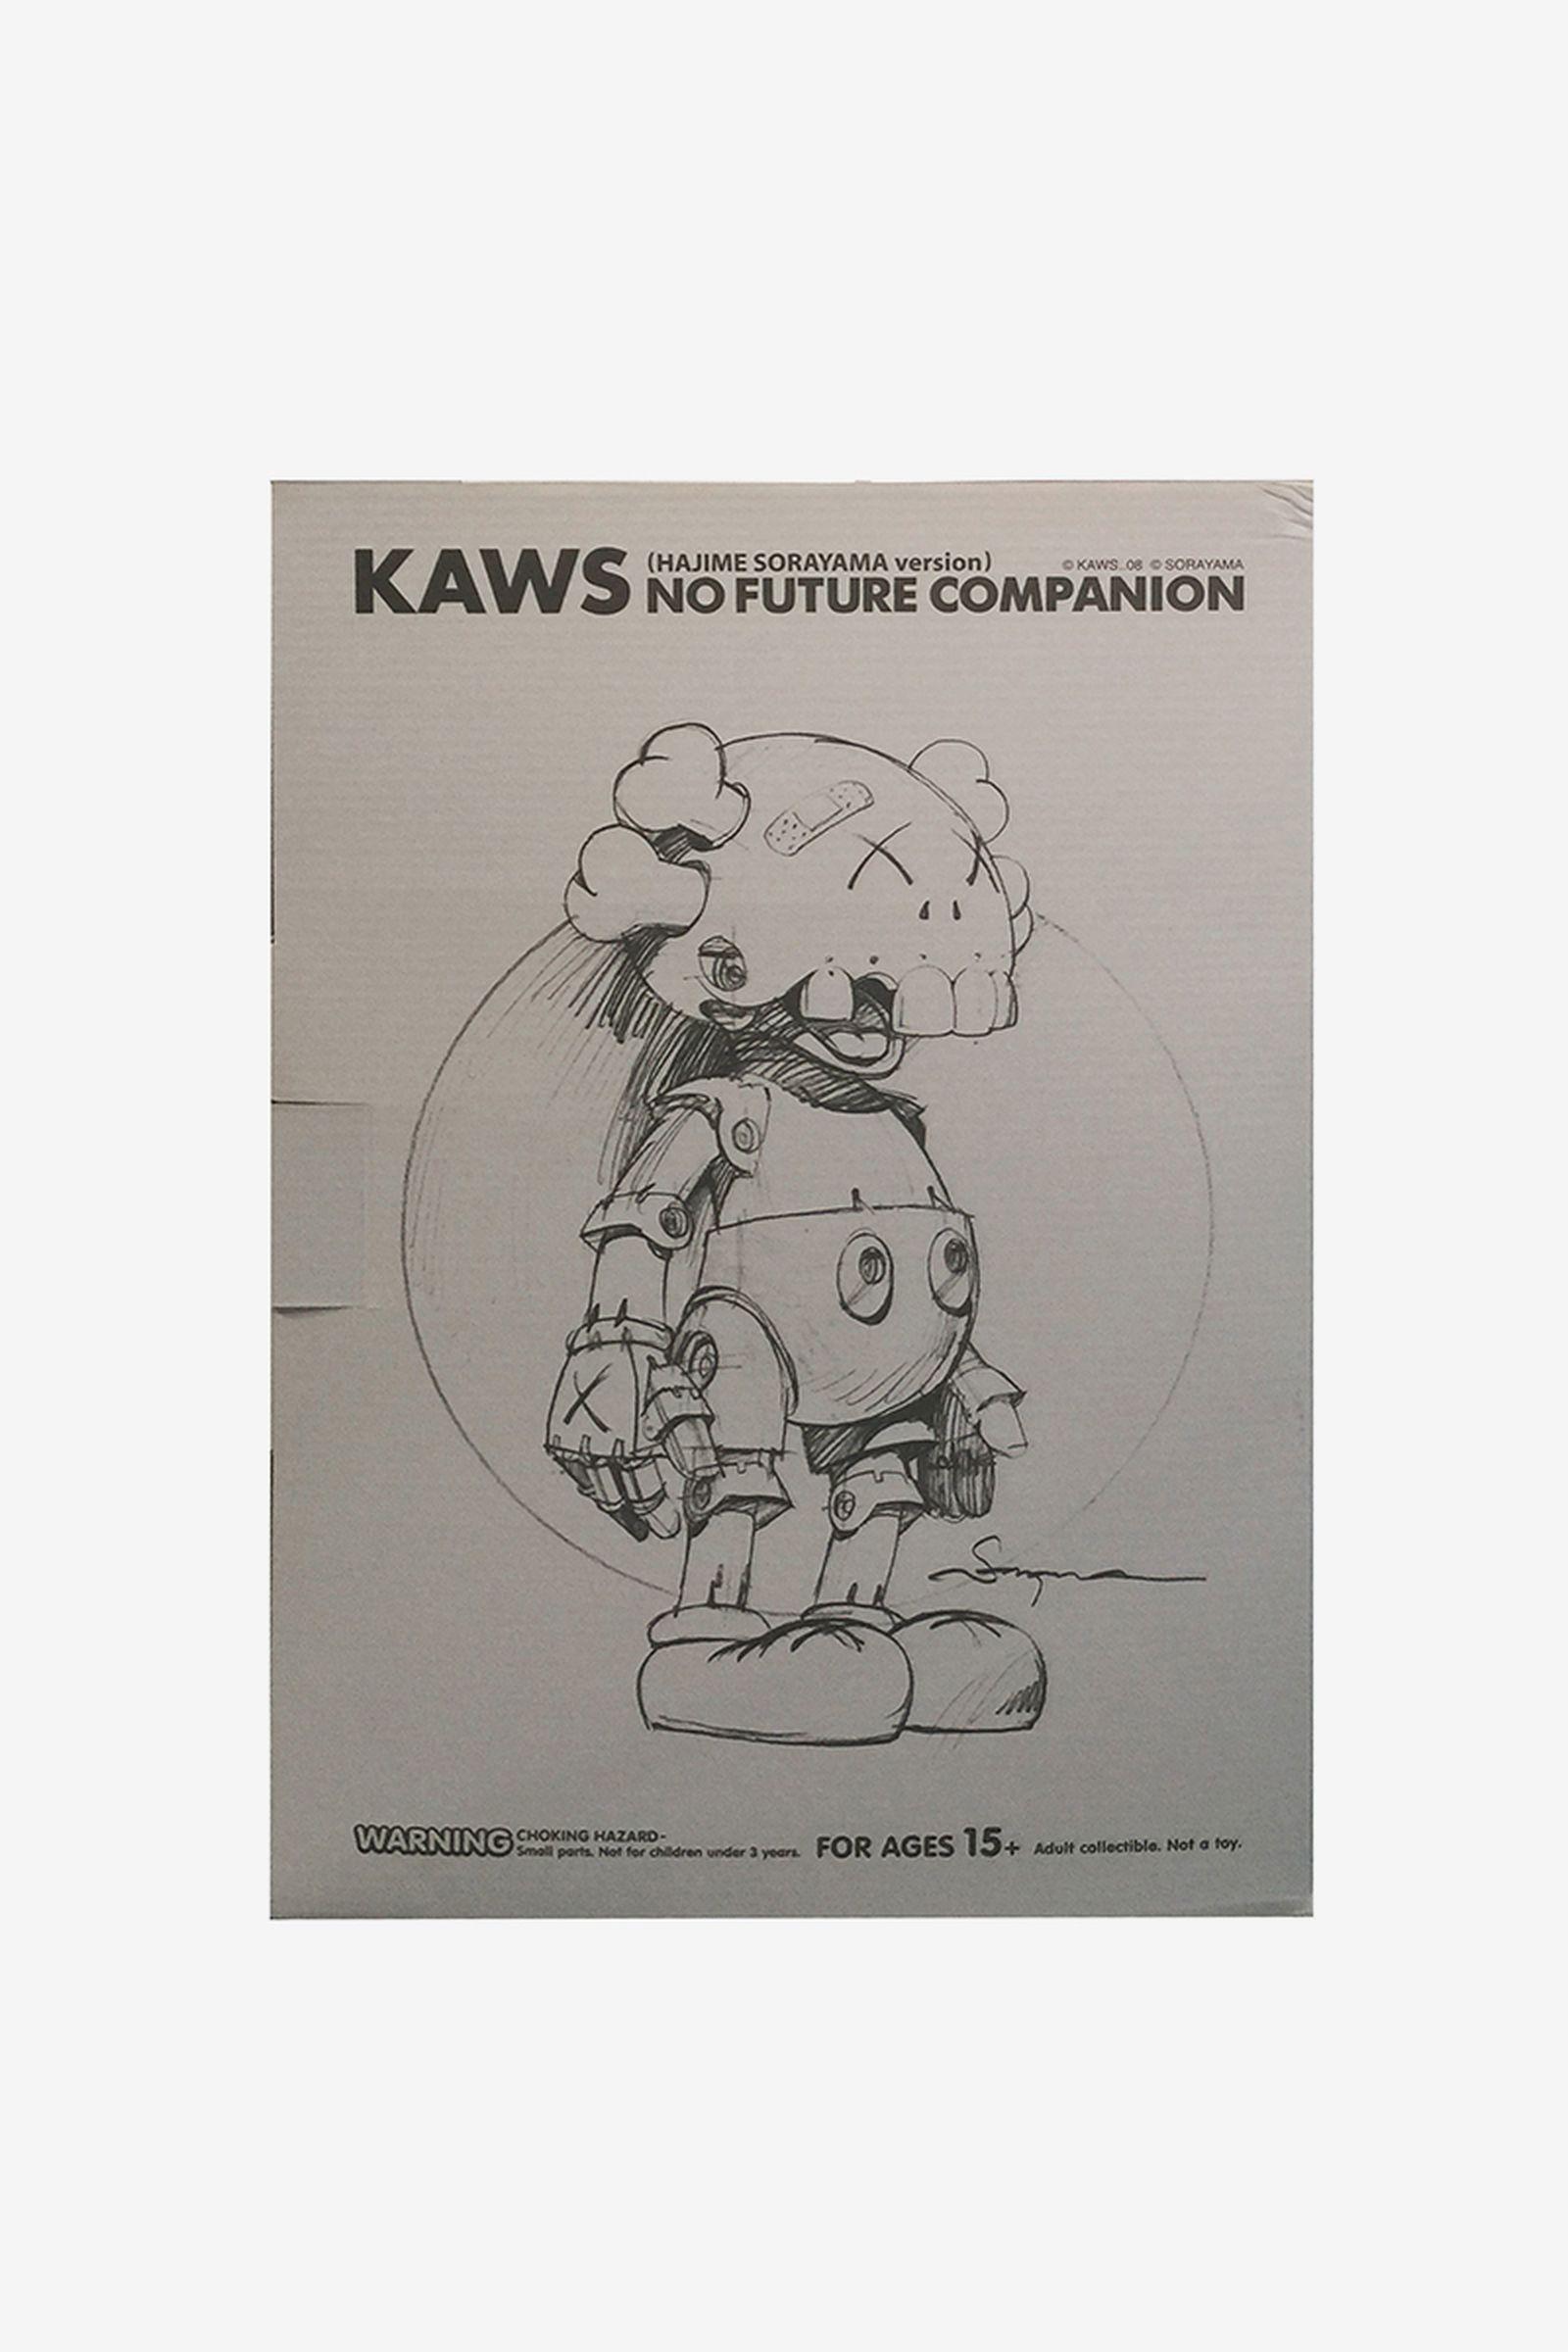 kaws silver 000 Richard Hambleton invader paddle8